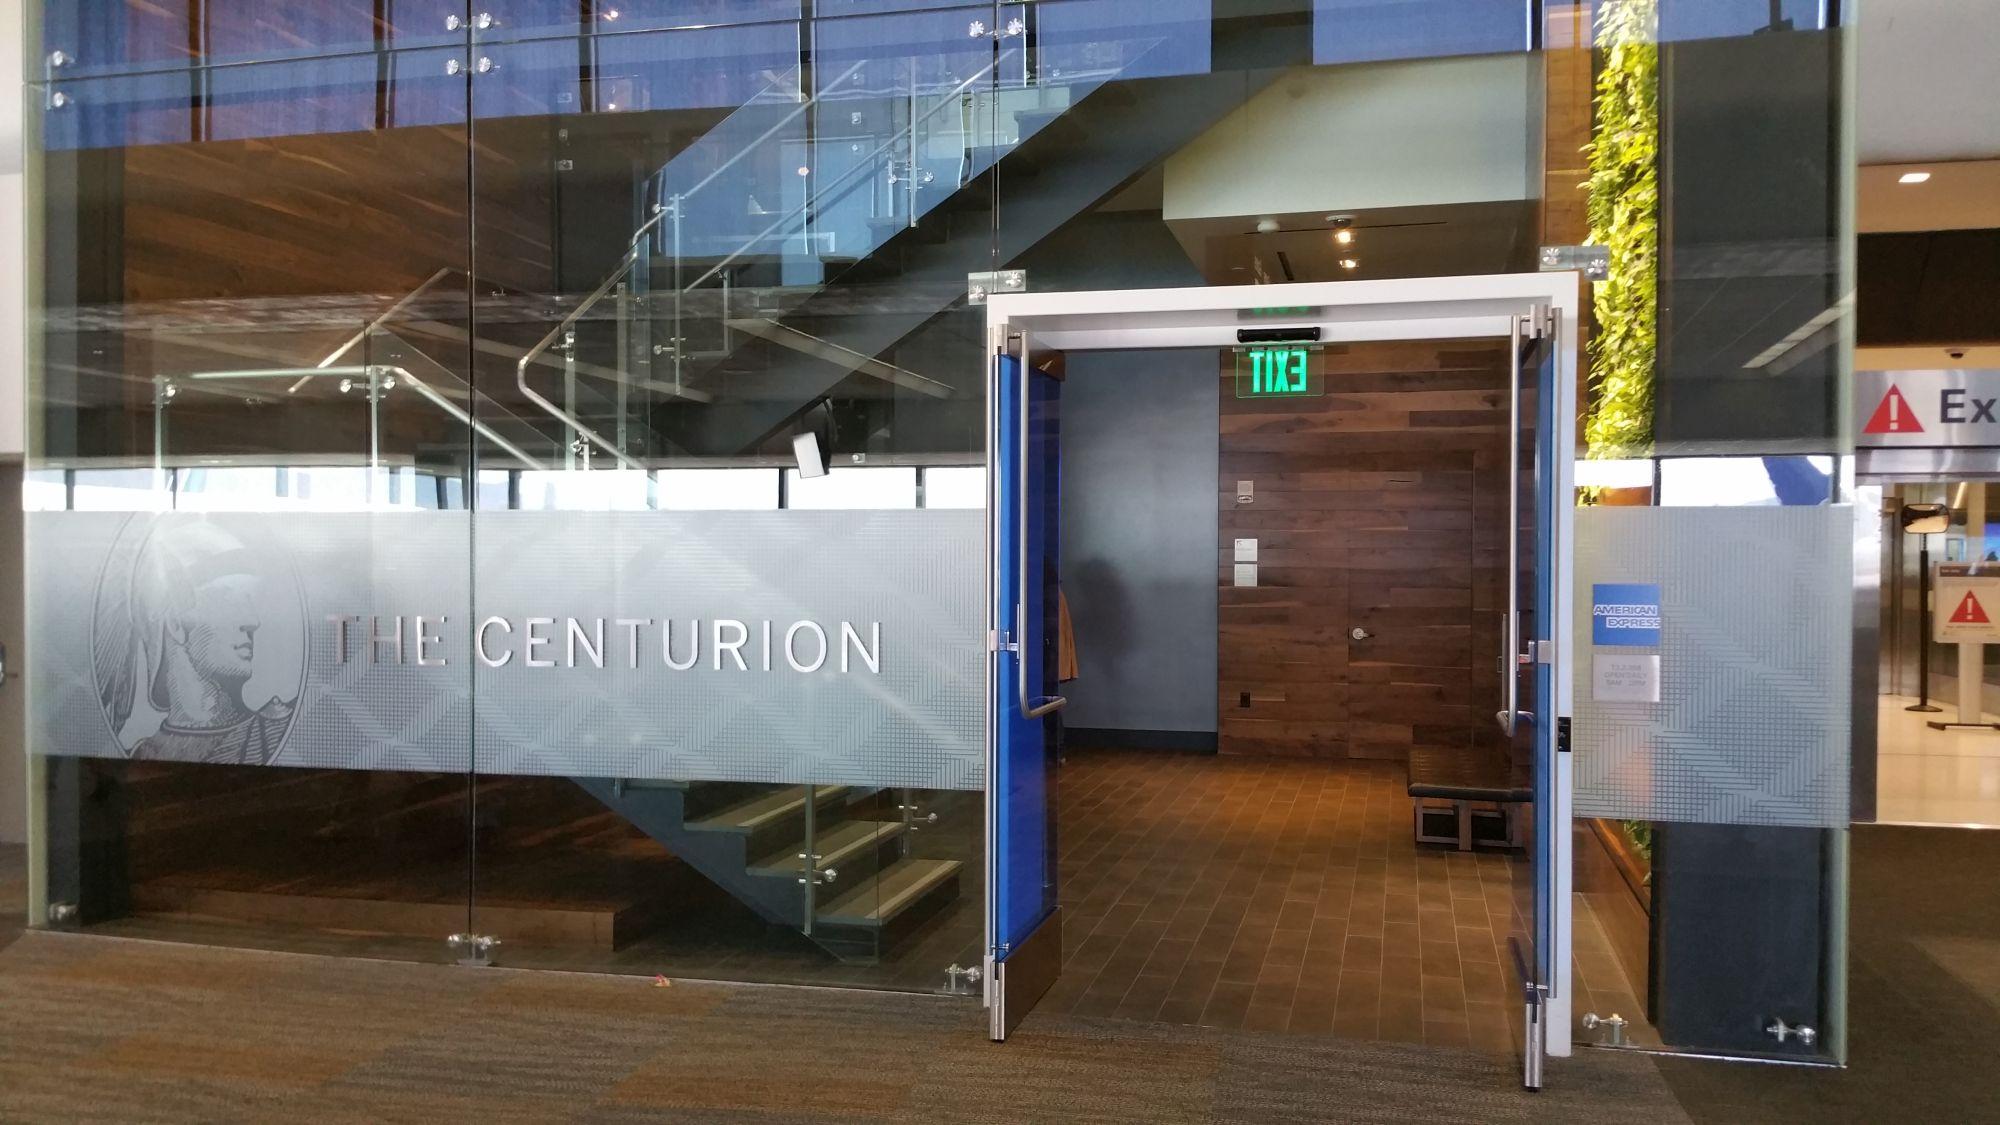 Lounge Review: American Express Centurion Lounge at San Francisco International Airport